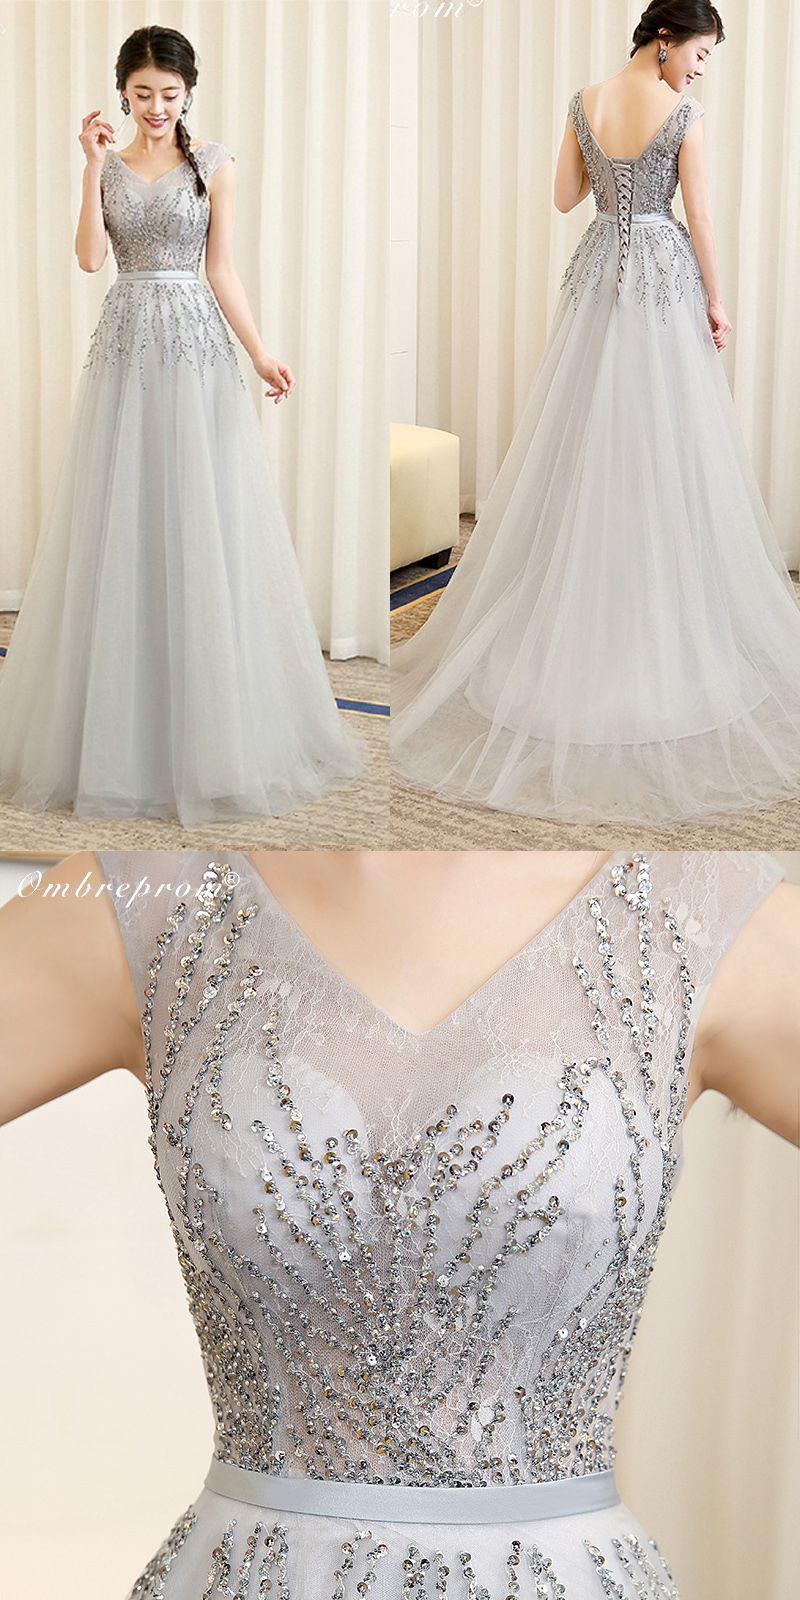 Ombreprom elegant prom dresses high quality top design sleeveless